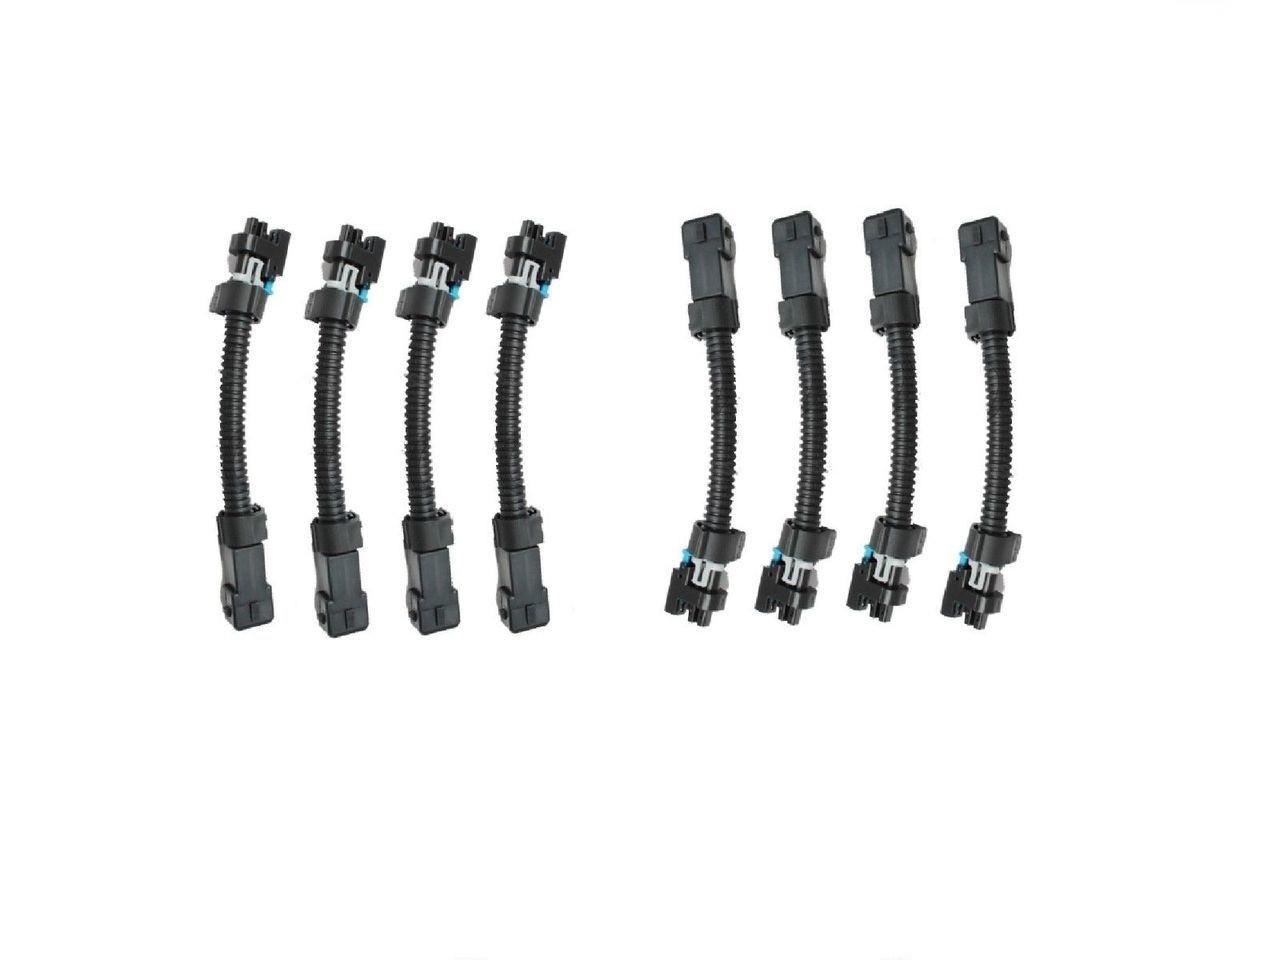 LS1 LS6 LT1 EV1 vehicle Injector Harness adapter to LQ4